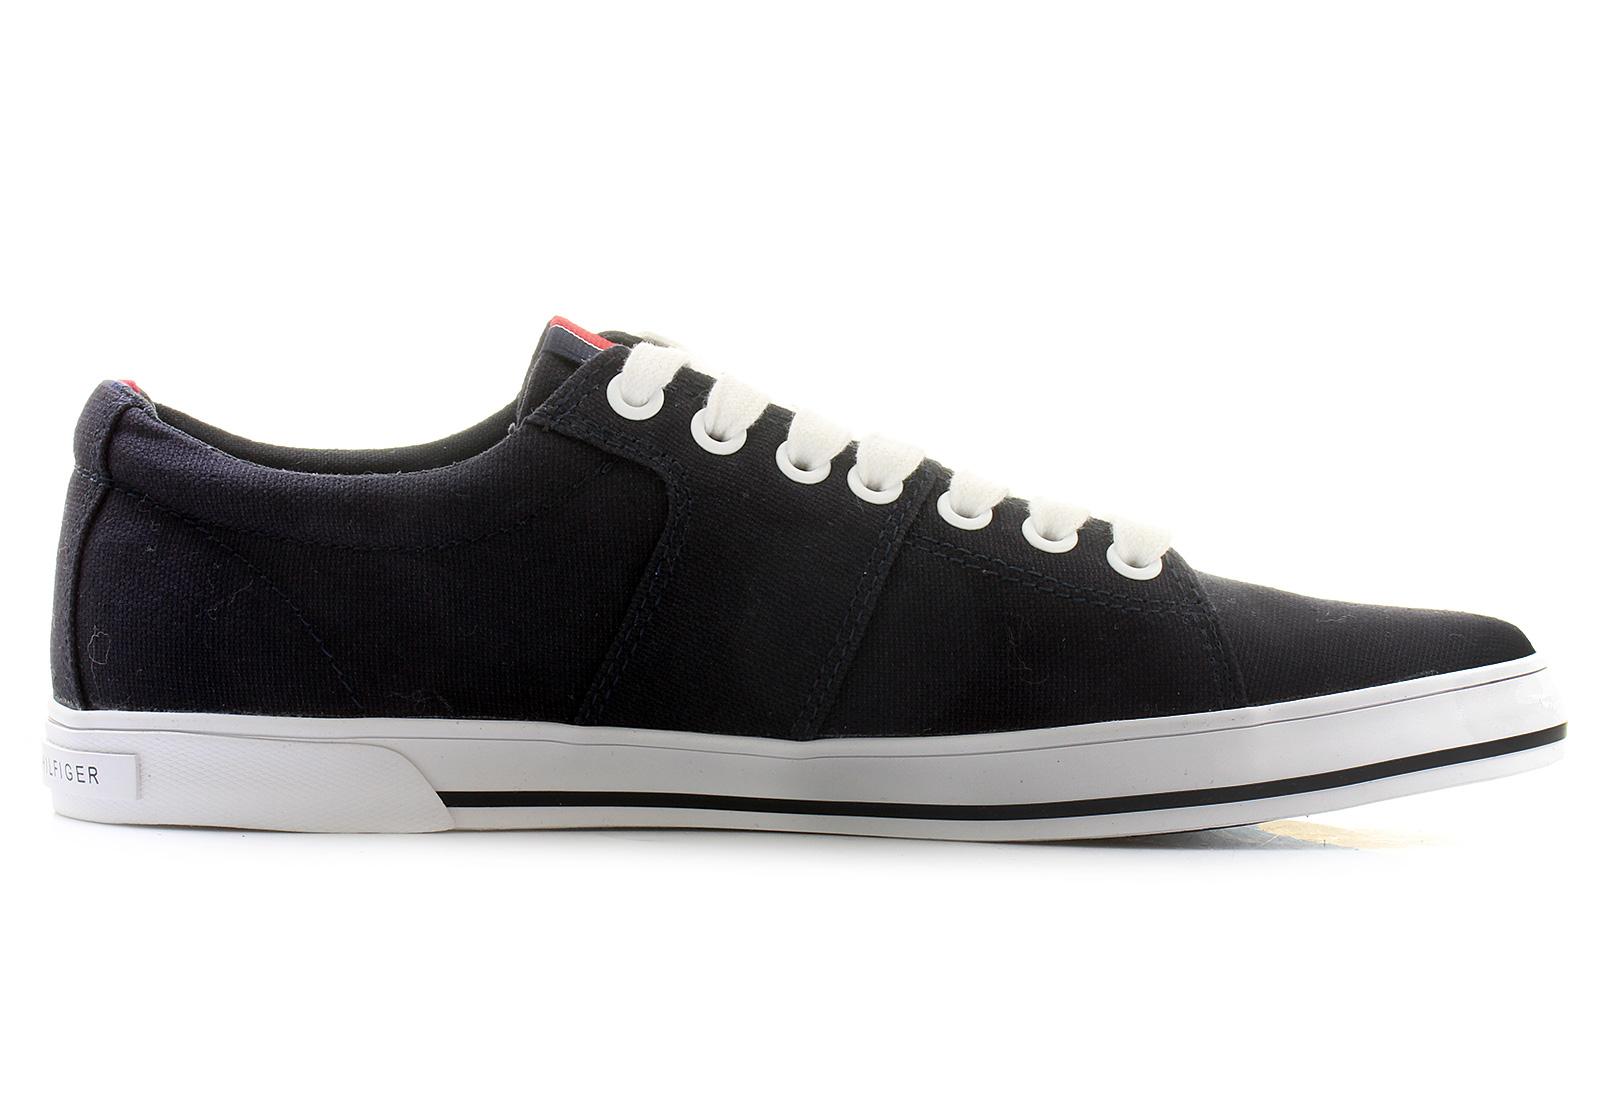 40571f61196072 Tommy Hilfiger Shoes - Harry 5d - 14S-6972-403 - Online shop for ...